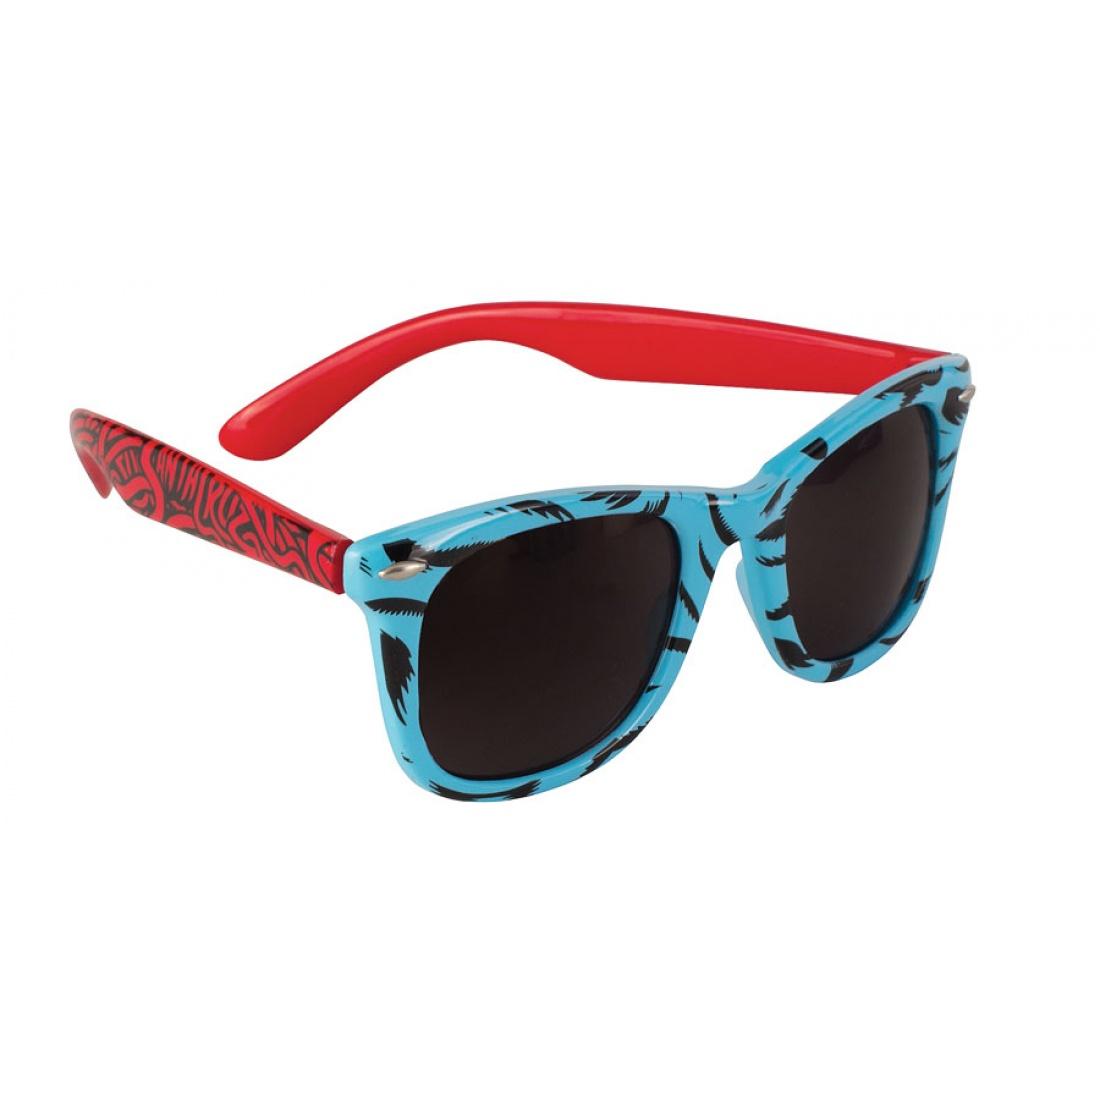 SCZ-Screaming Sunglasses Blue OS Unisex